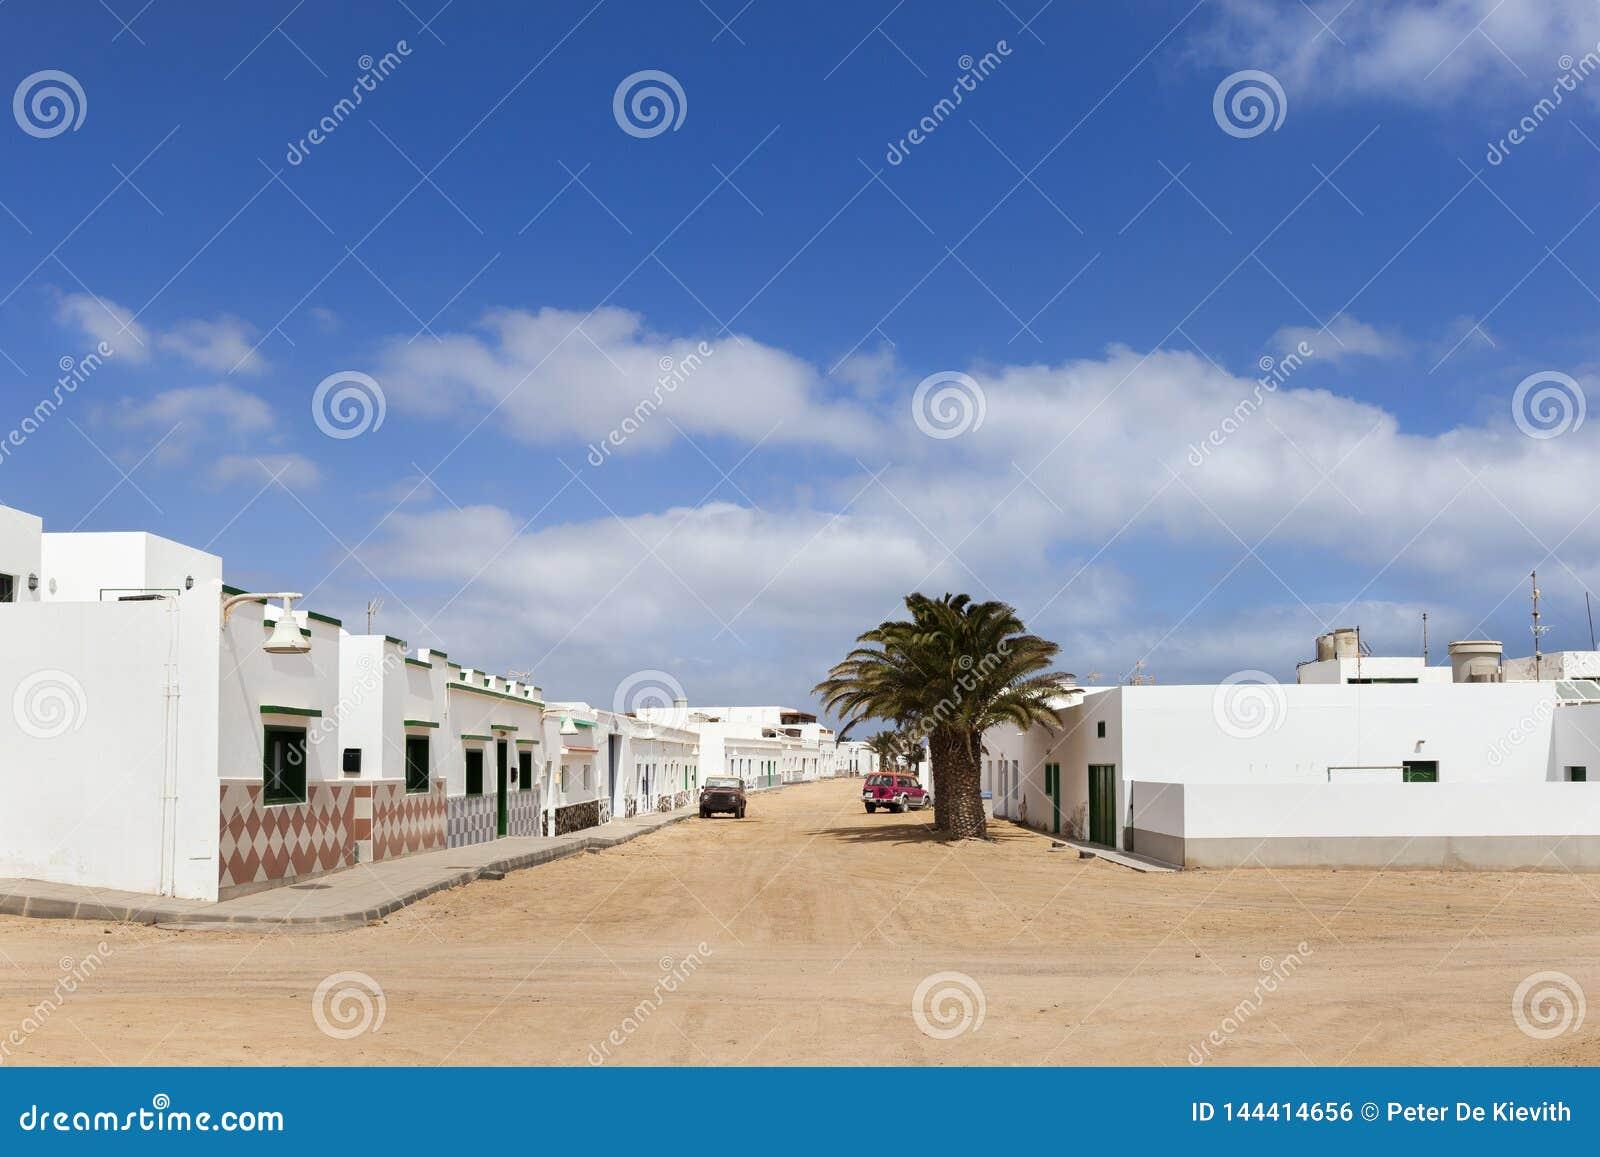 Lege straat met zand en witte huizen in Caleta DE Sebo op eilandla Graciosa